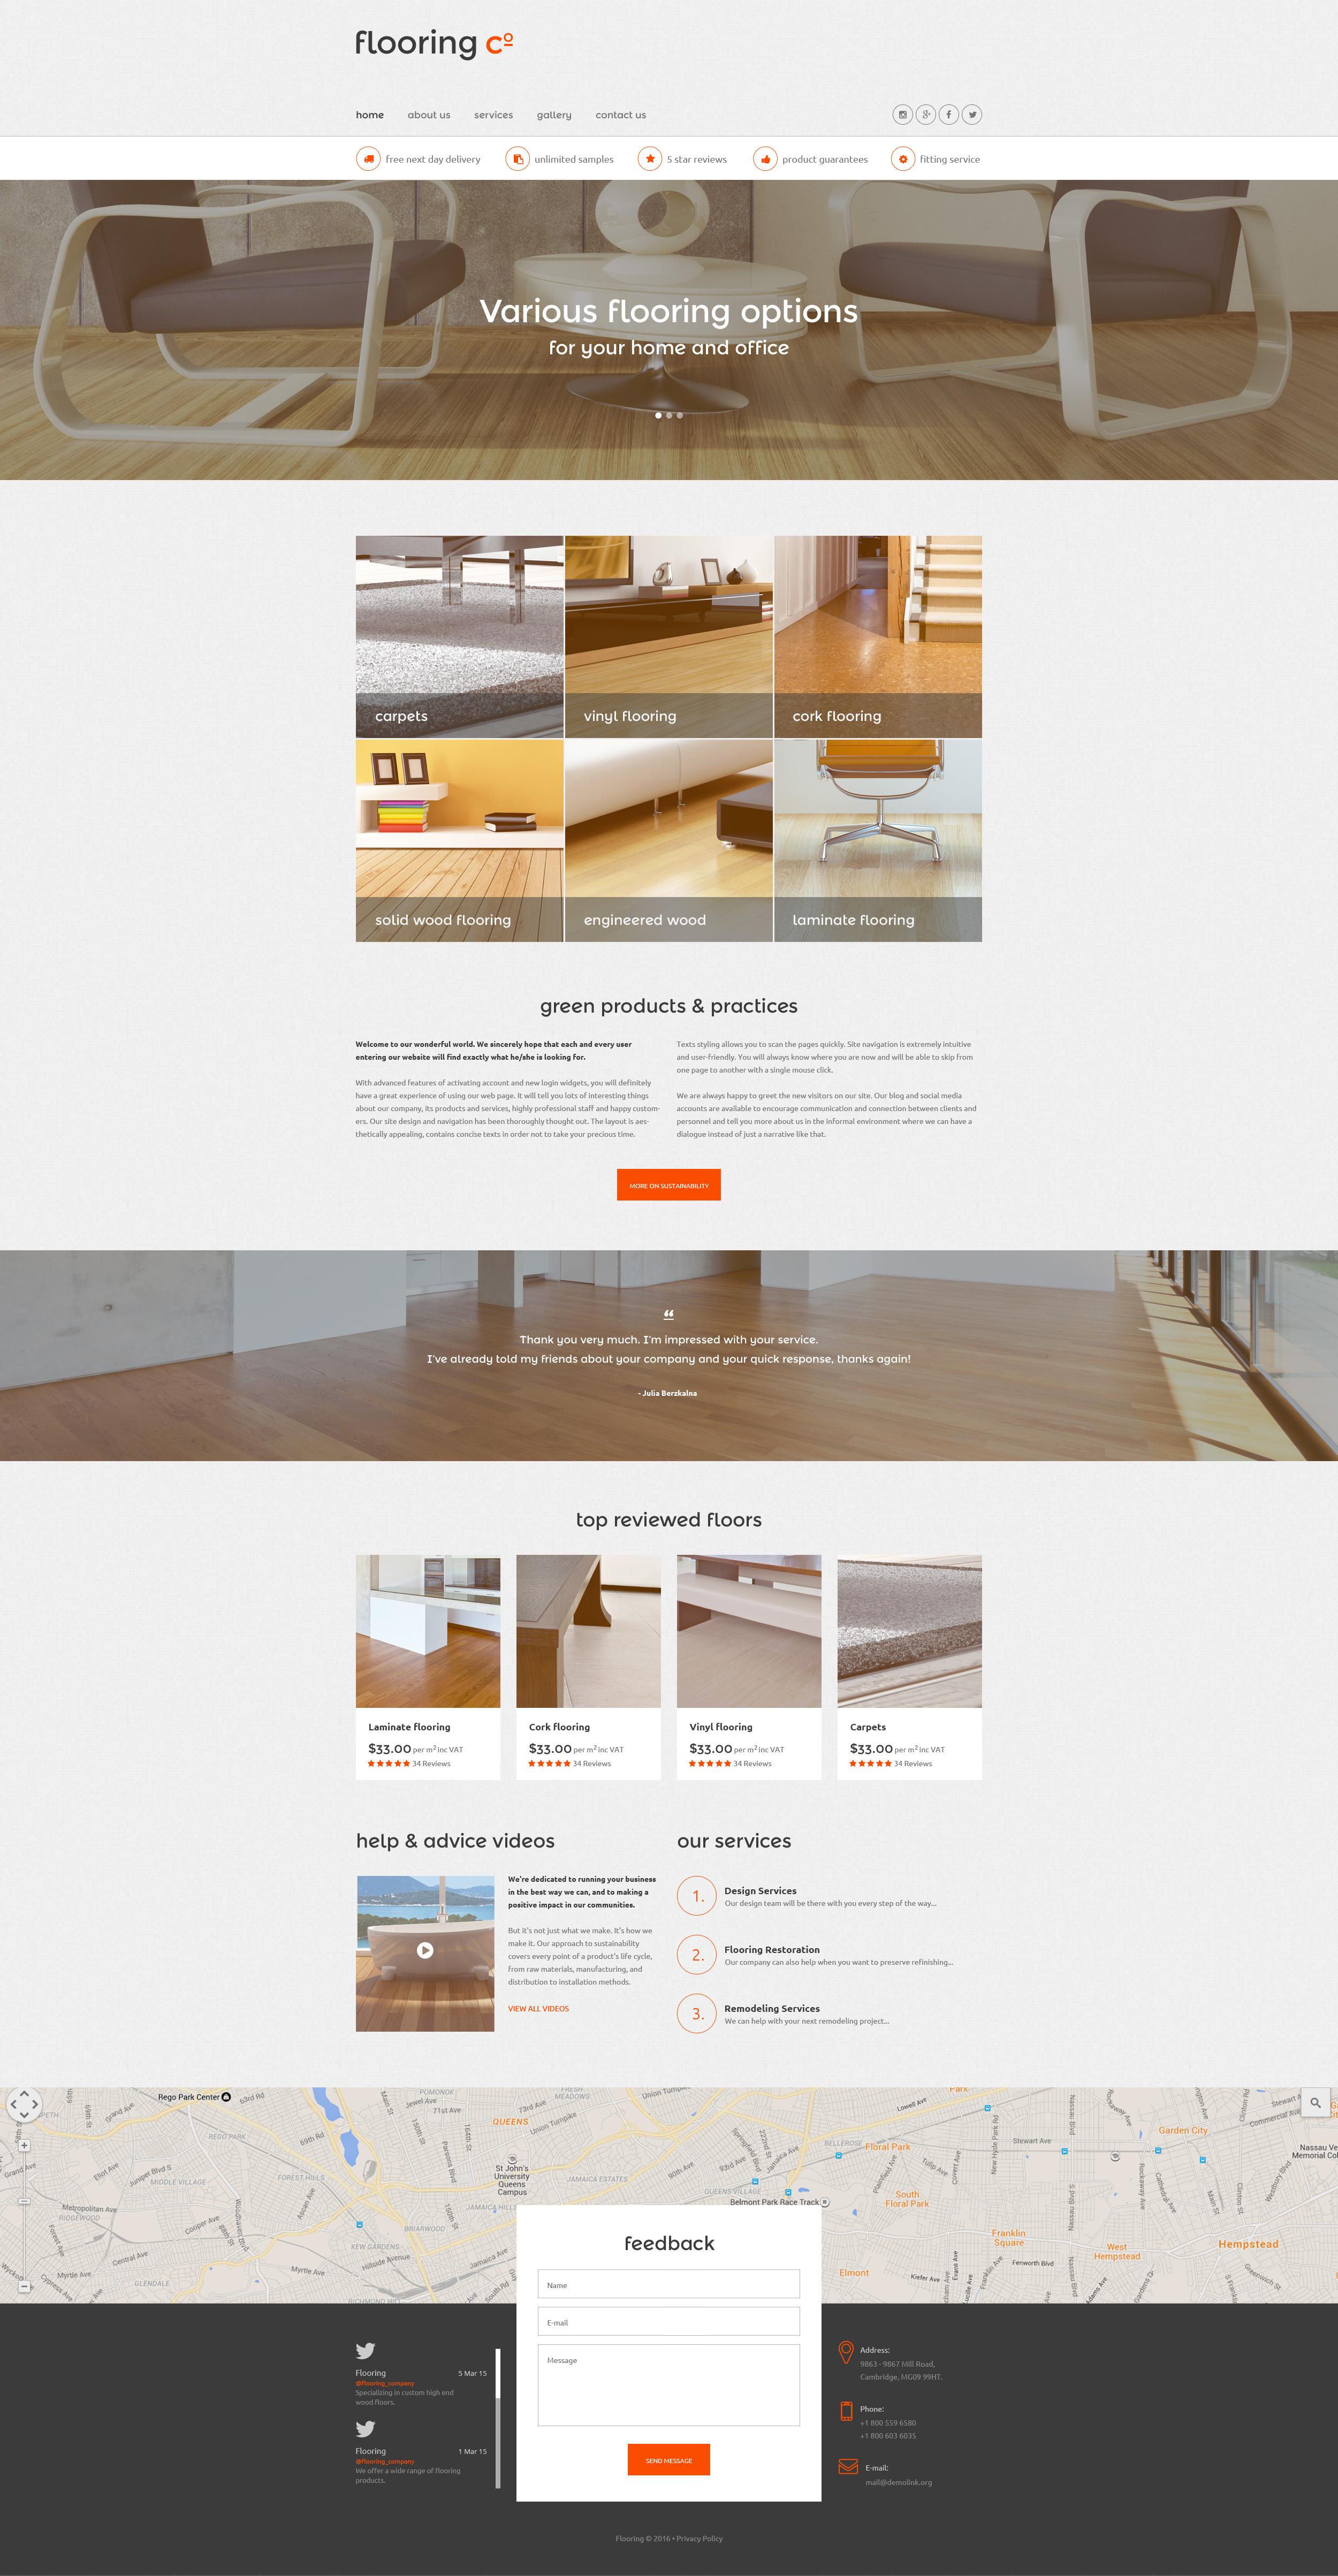 """Flooring Co."" - адаптивний Шаблон сайту №56096 - скріншот"